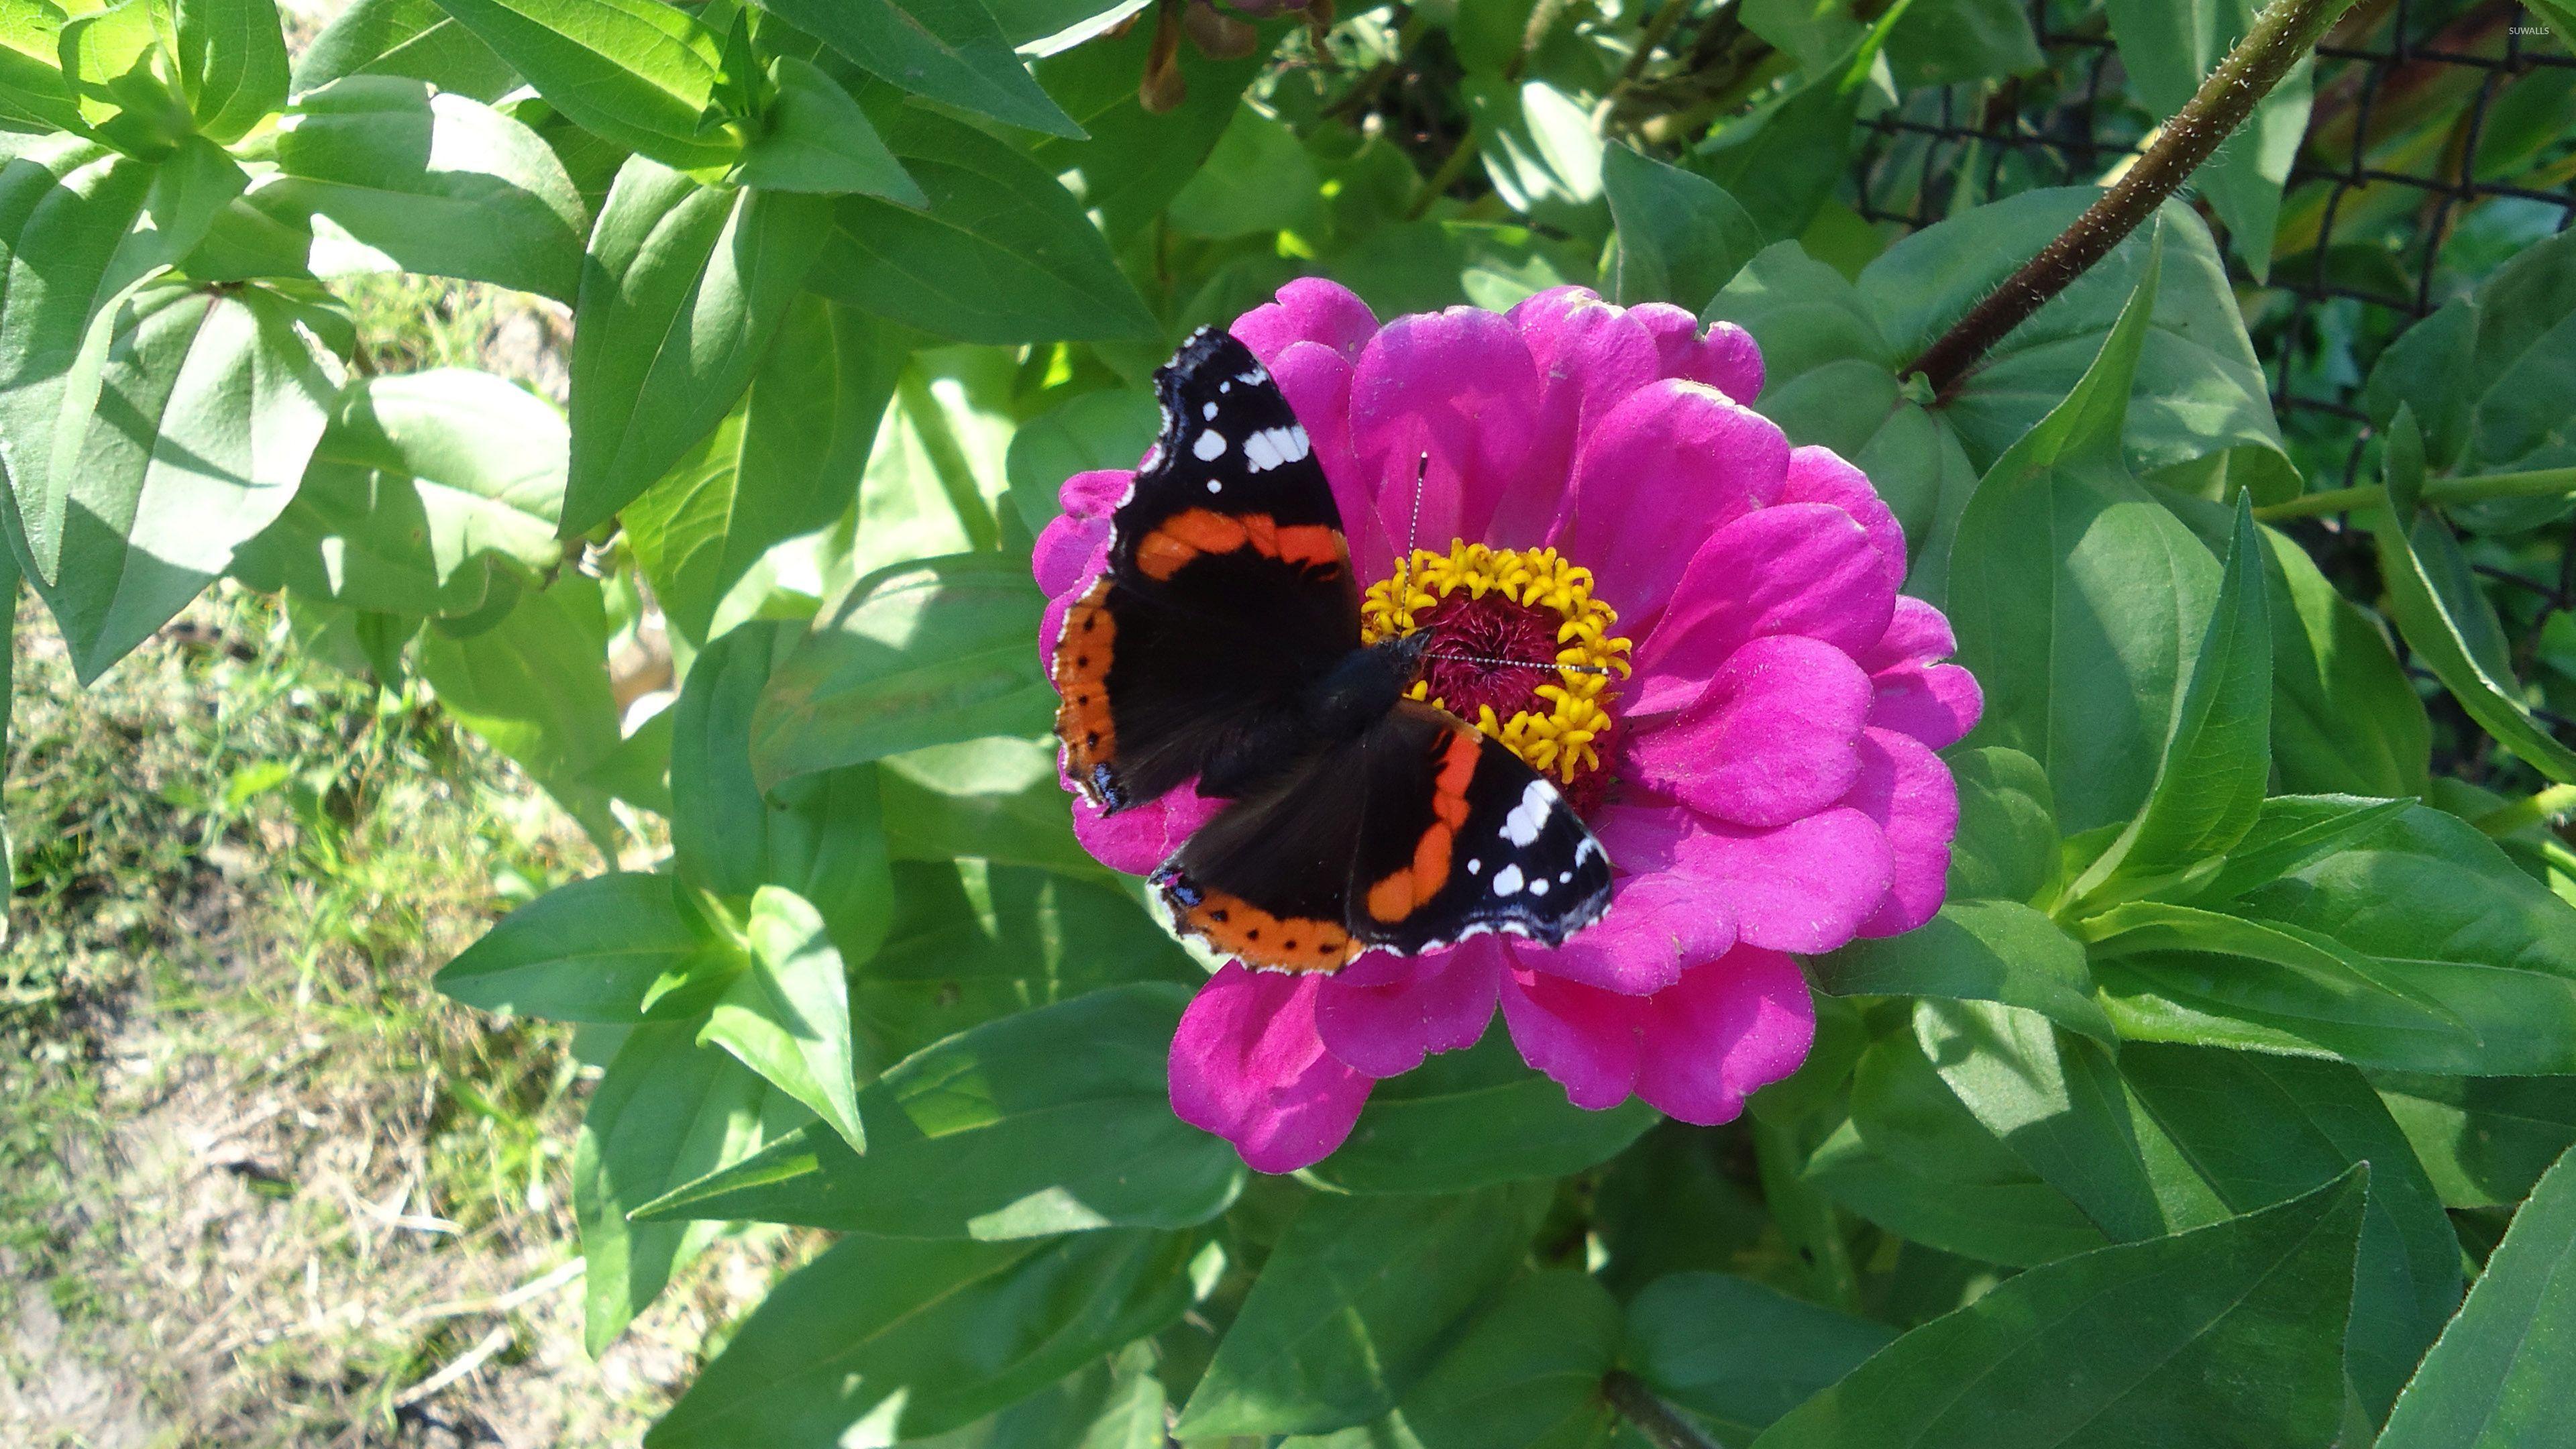 Dark butterfly on the pink flower wallpaper - Animal ...